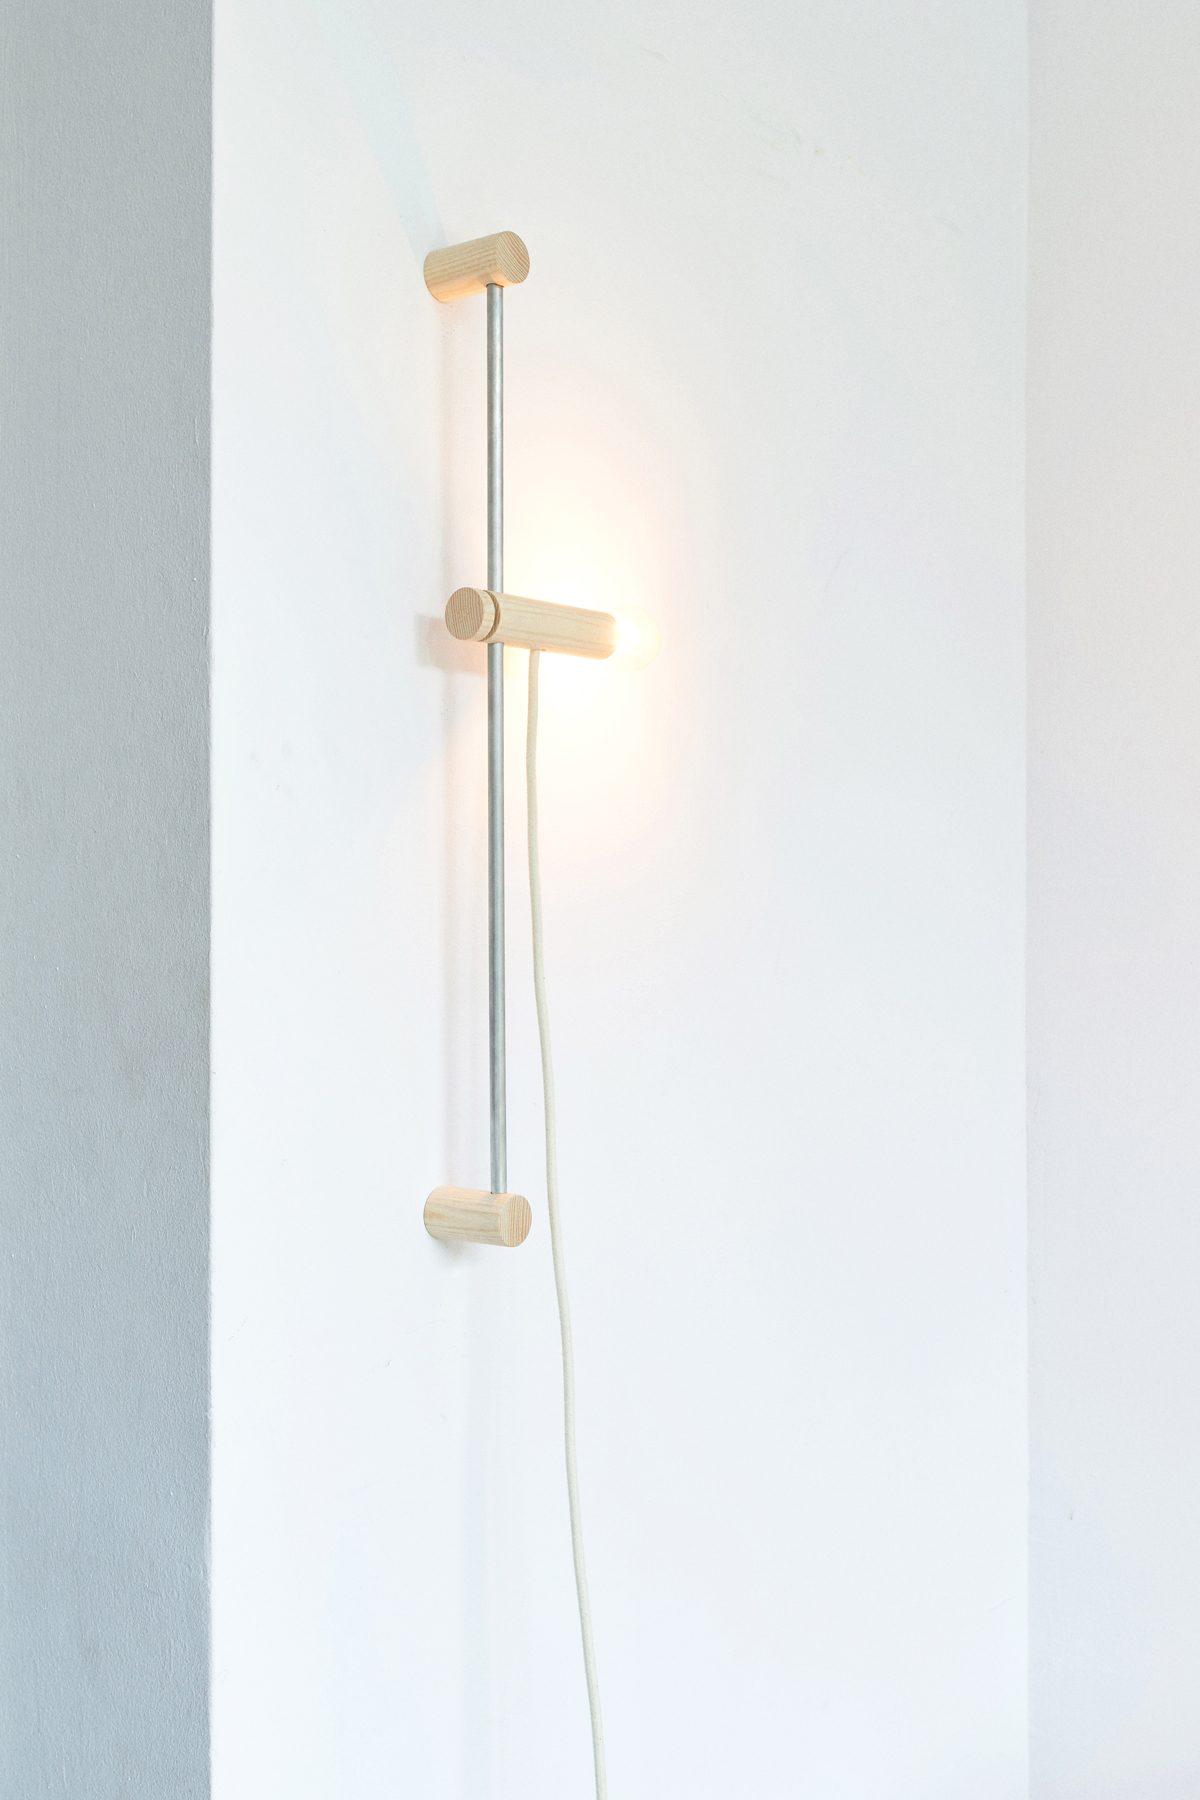 Wandlamp SET van STILST – Gimmii